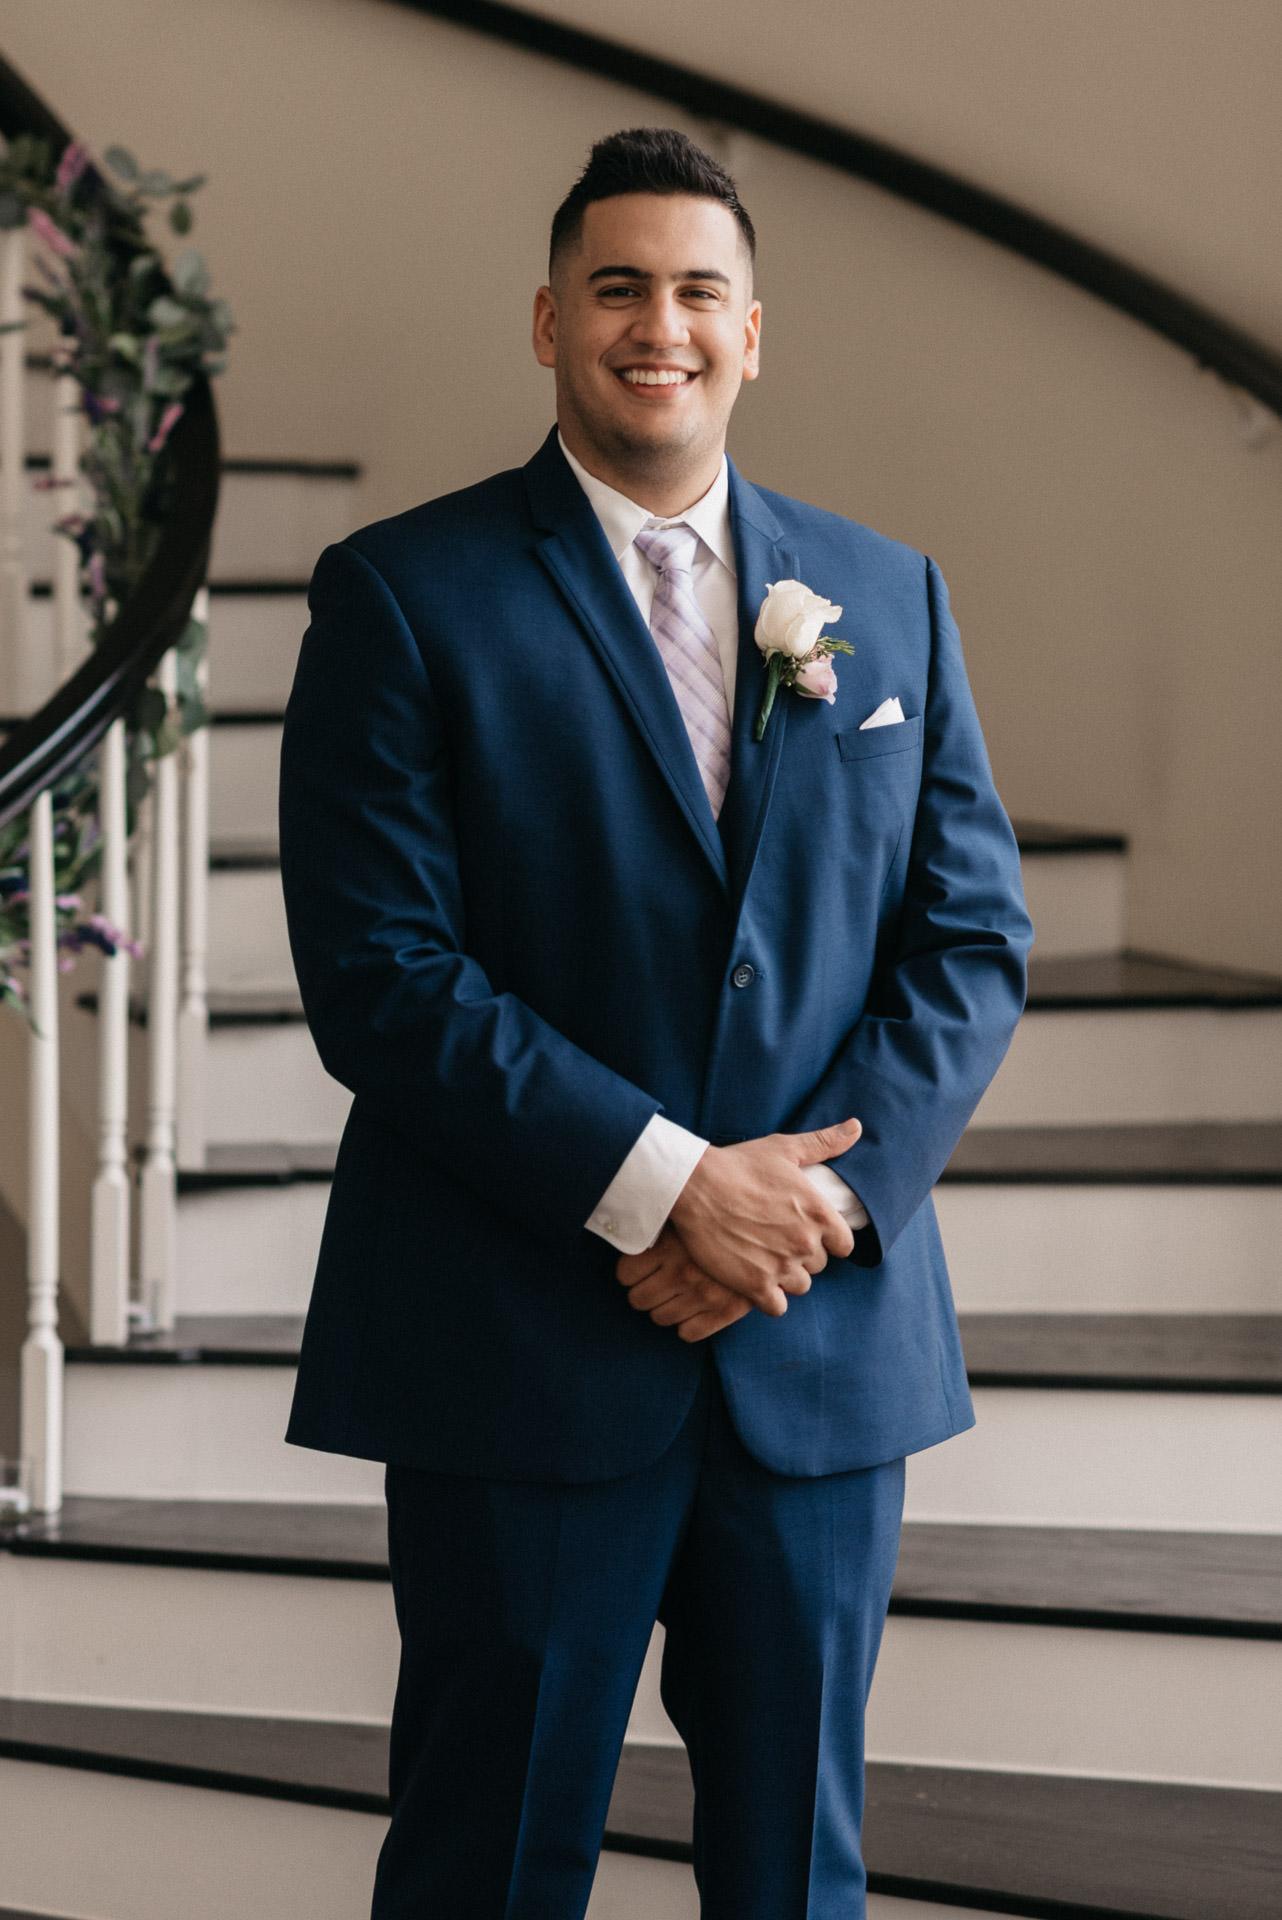 lexi-michael-wedding-blog-sm-44.jpg